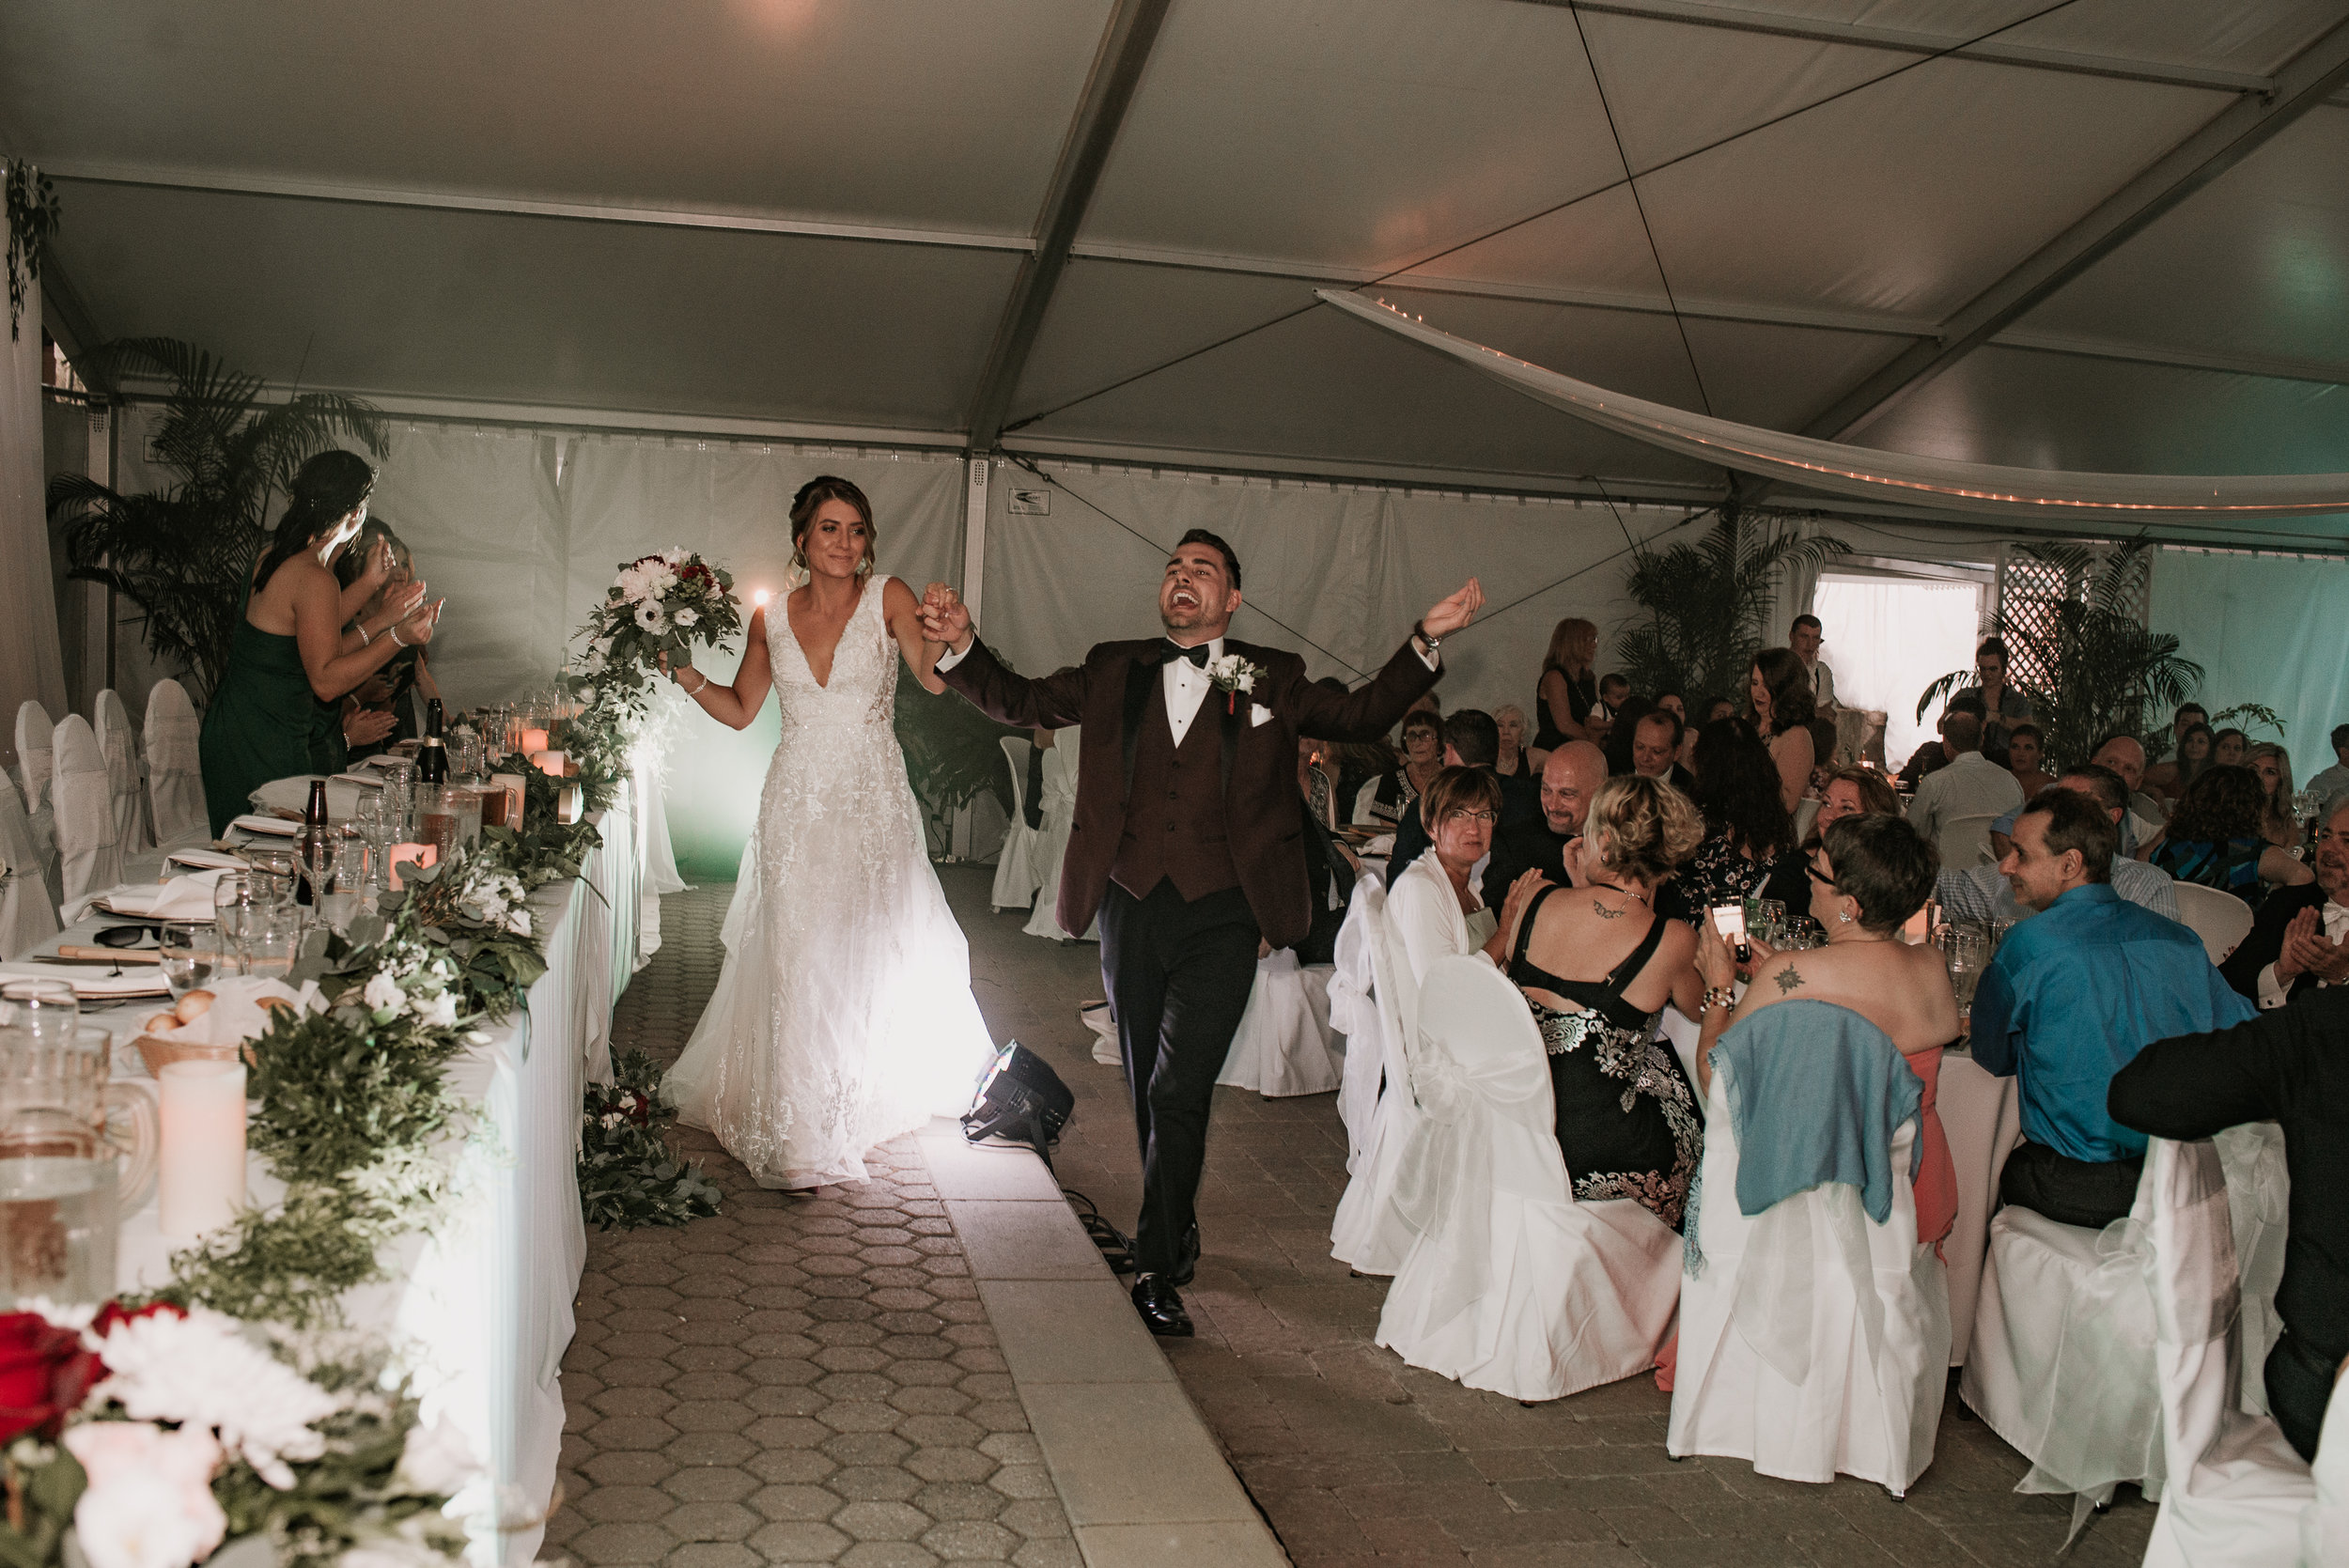 Claremont_fourseasons_Wedding-416.jpg